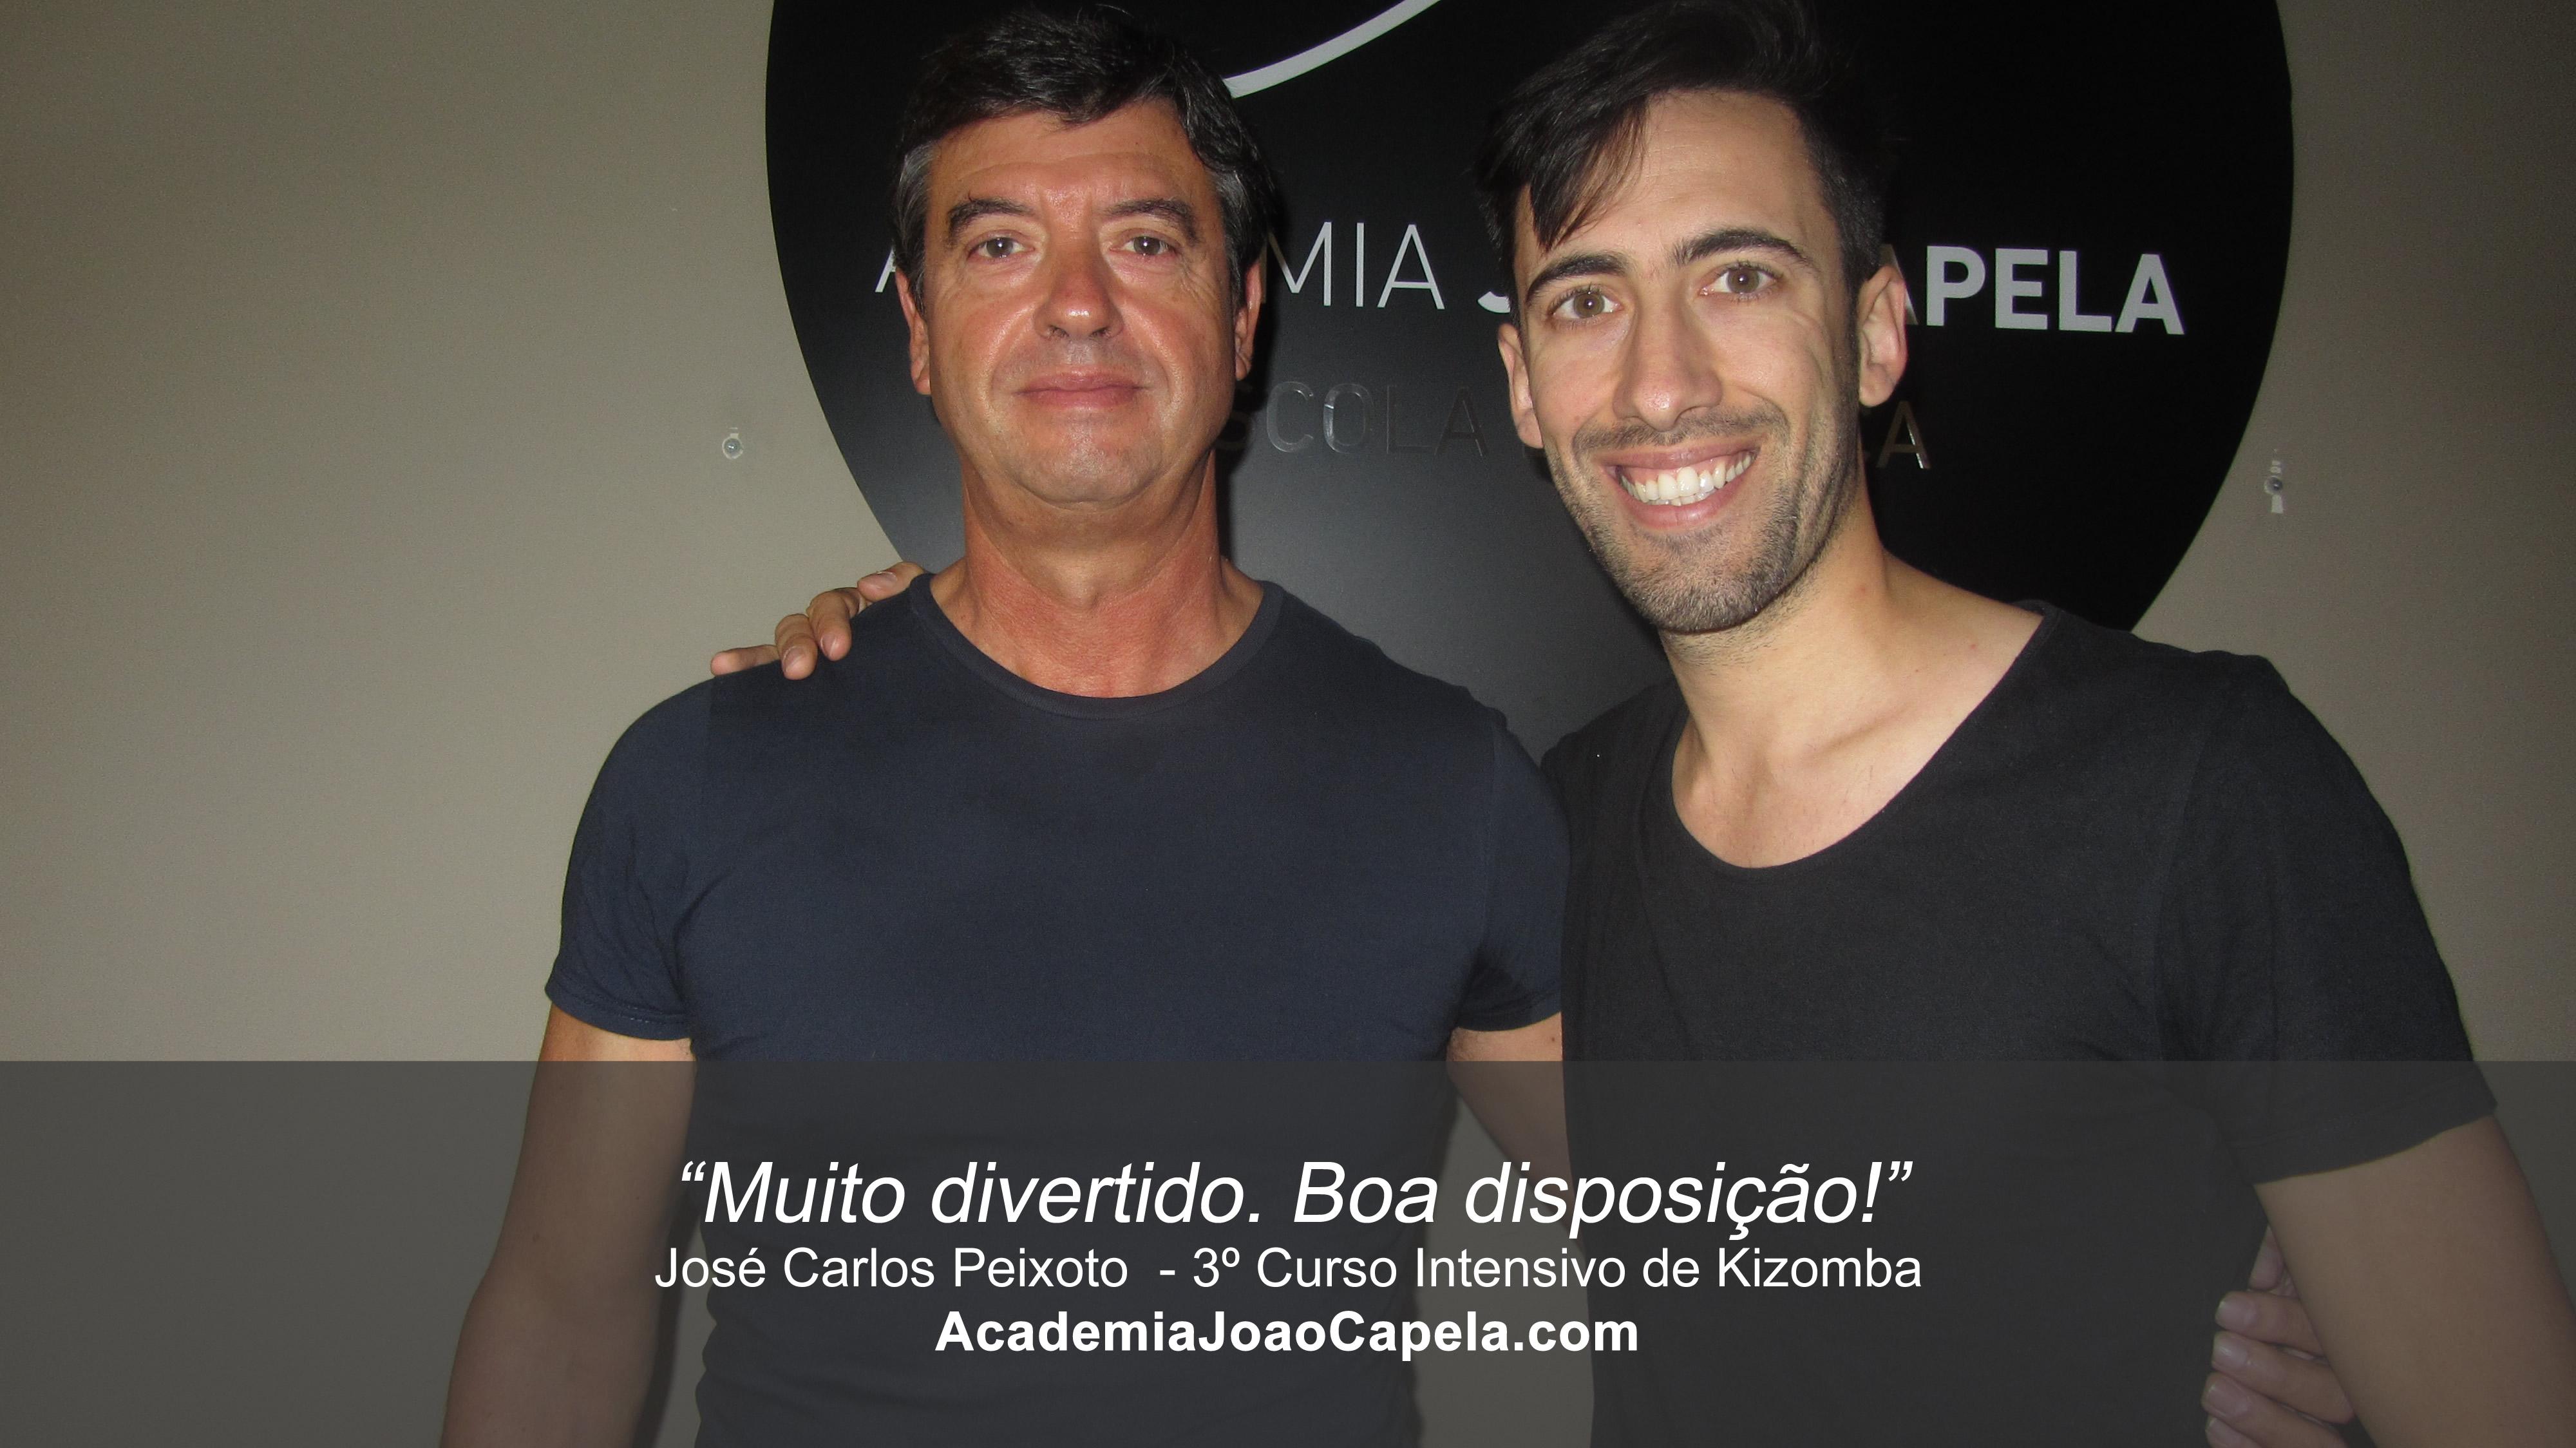 Testemunho José Carlos Peixoto 3º Curso Intensivo de Kizomba em Barcelos